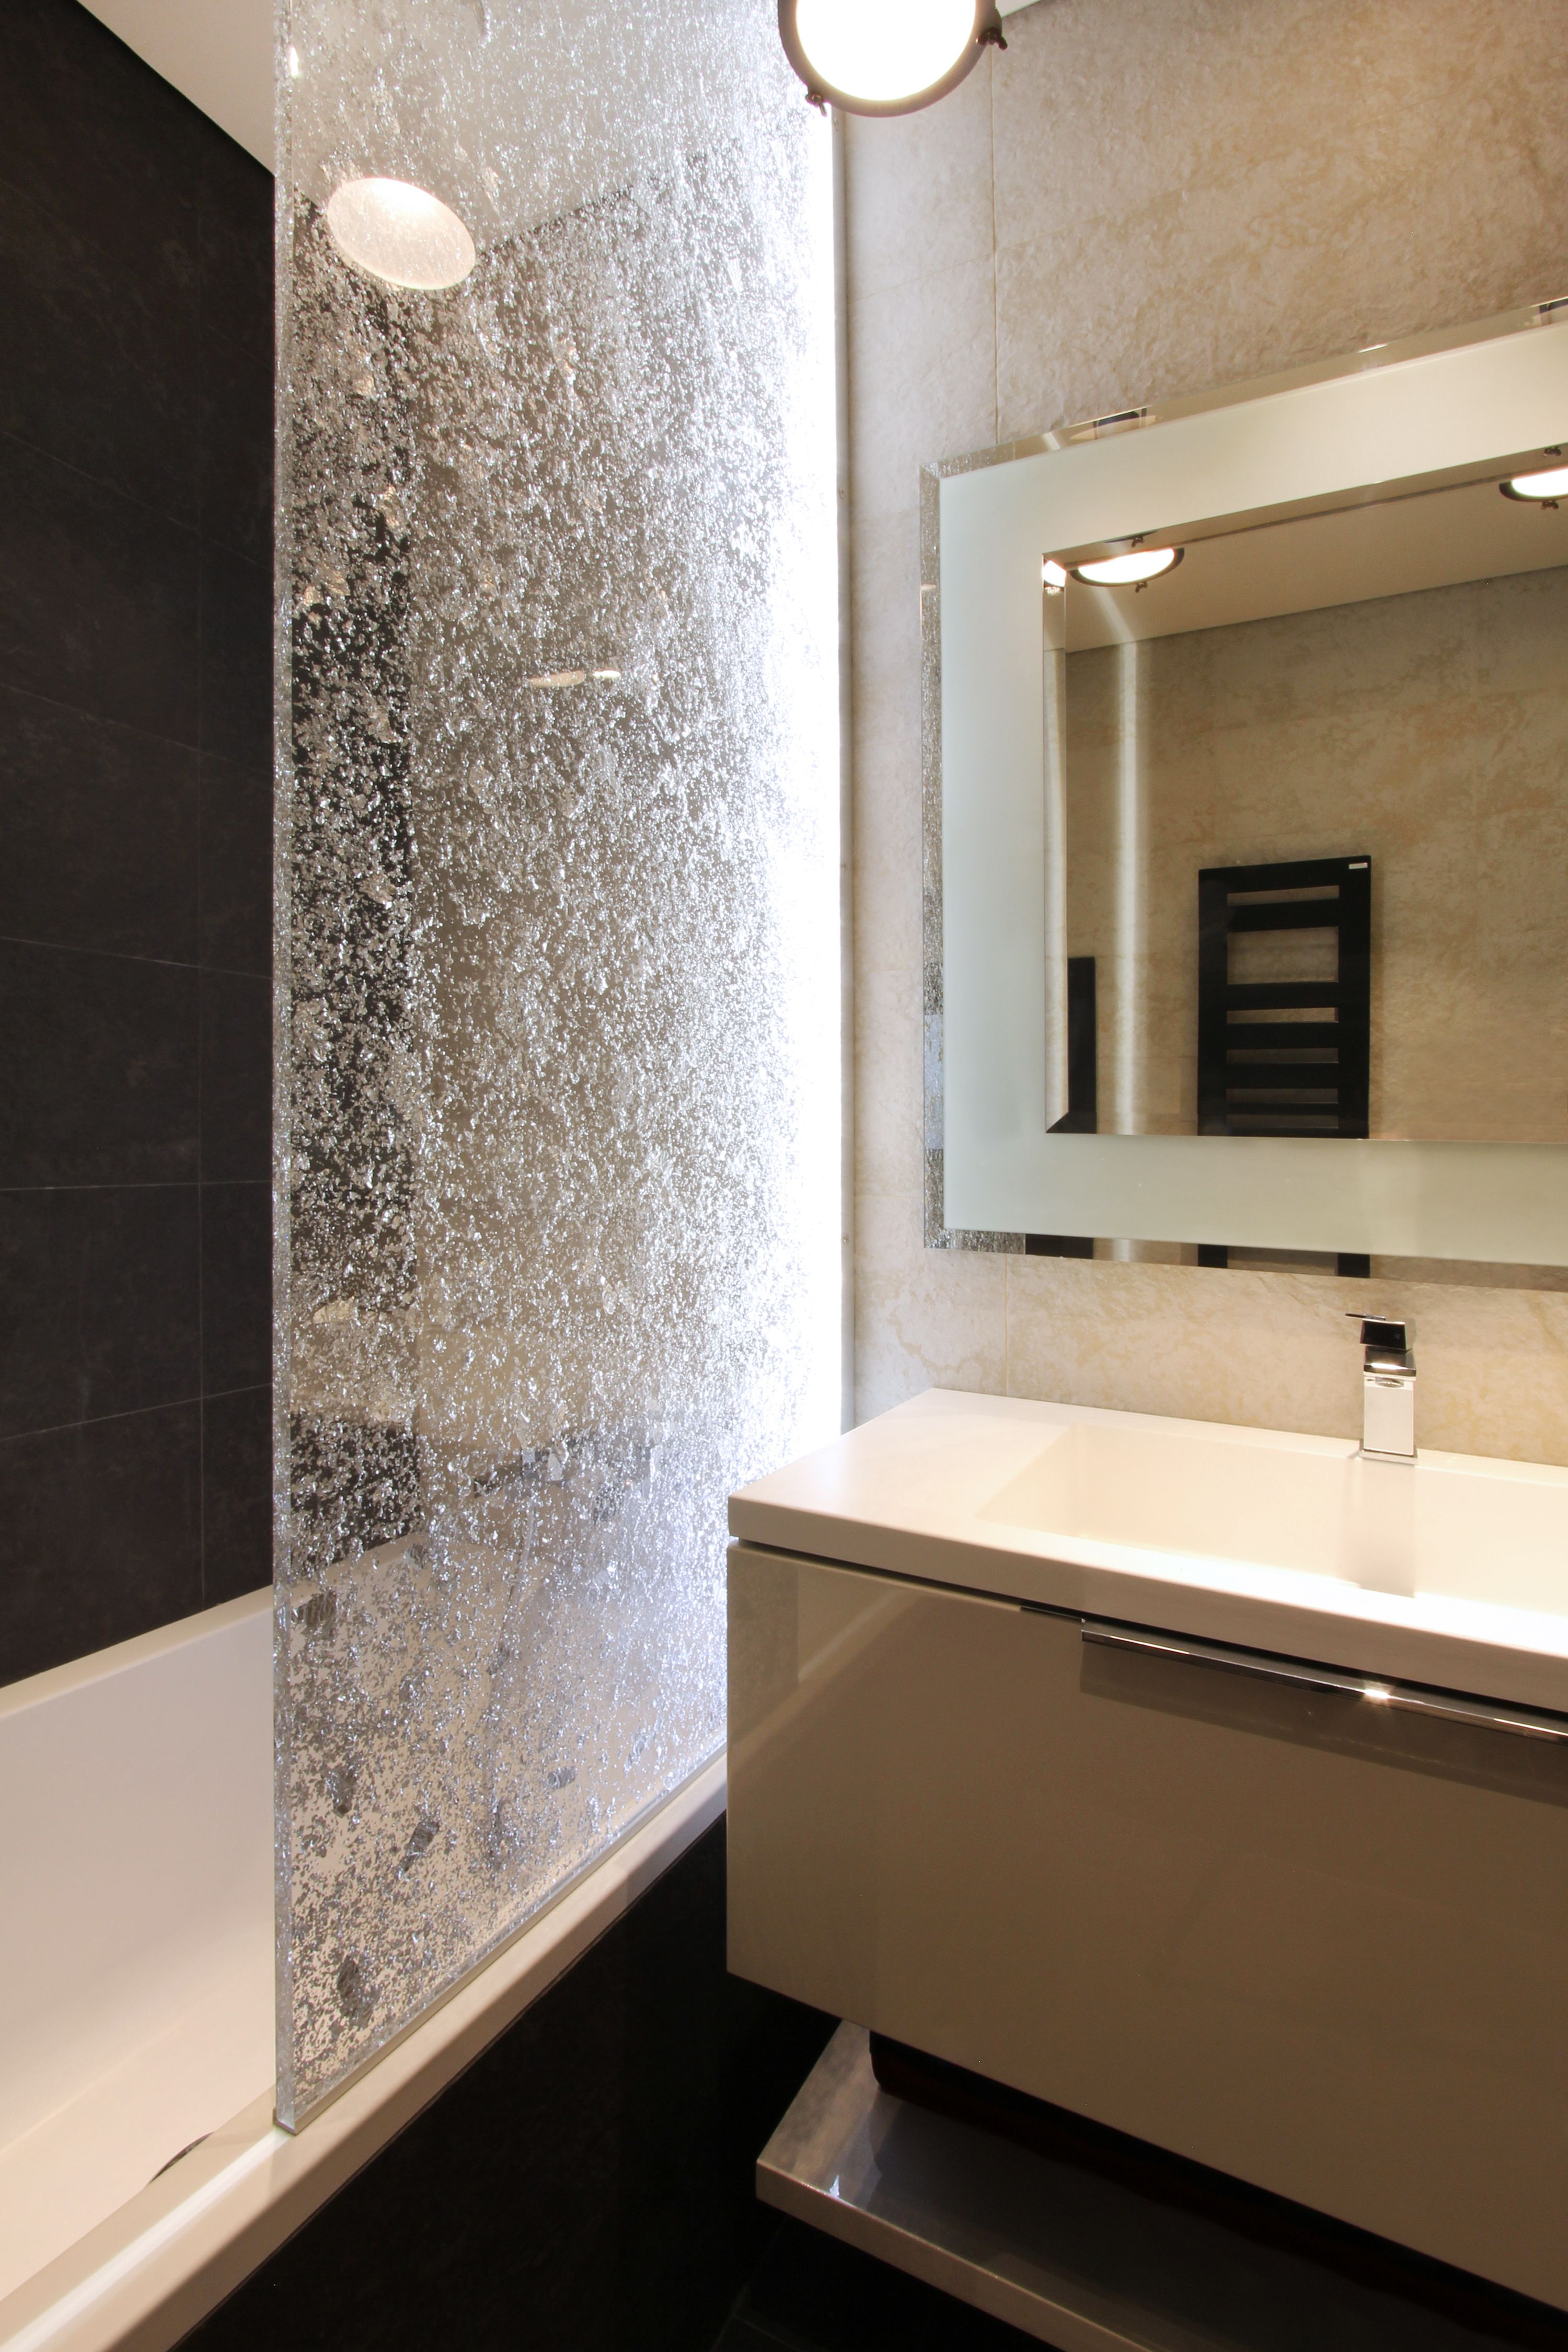 salle de bain paroi douche plexi incrust salle de bains pinterest paroi douche paroi. Black Bedroom Furniture Sets. Home Design Ideas